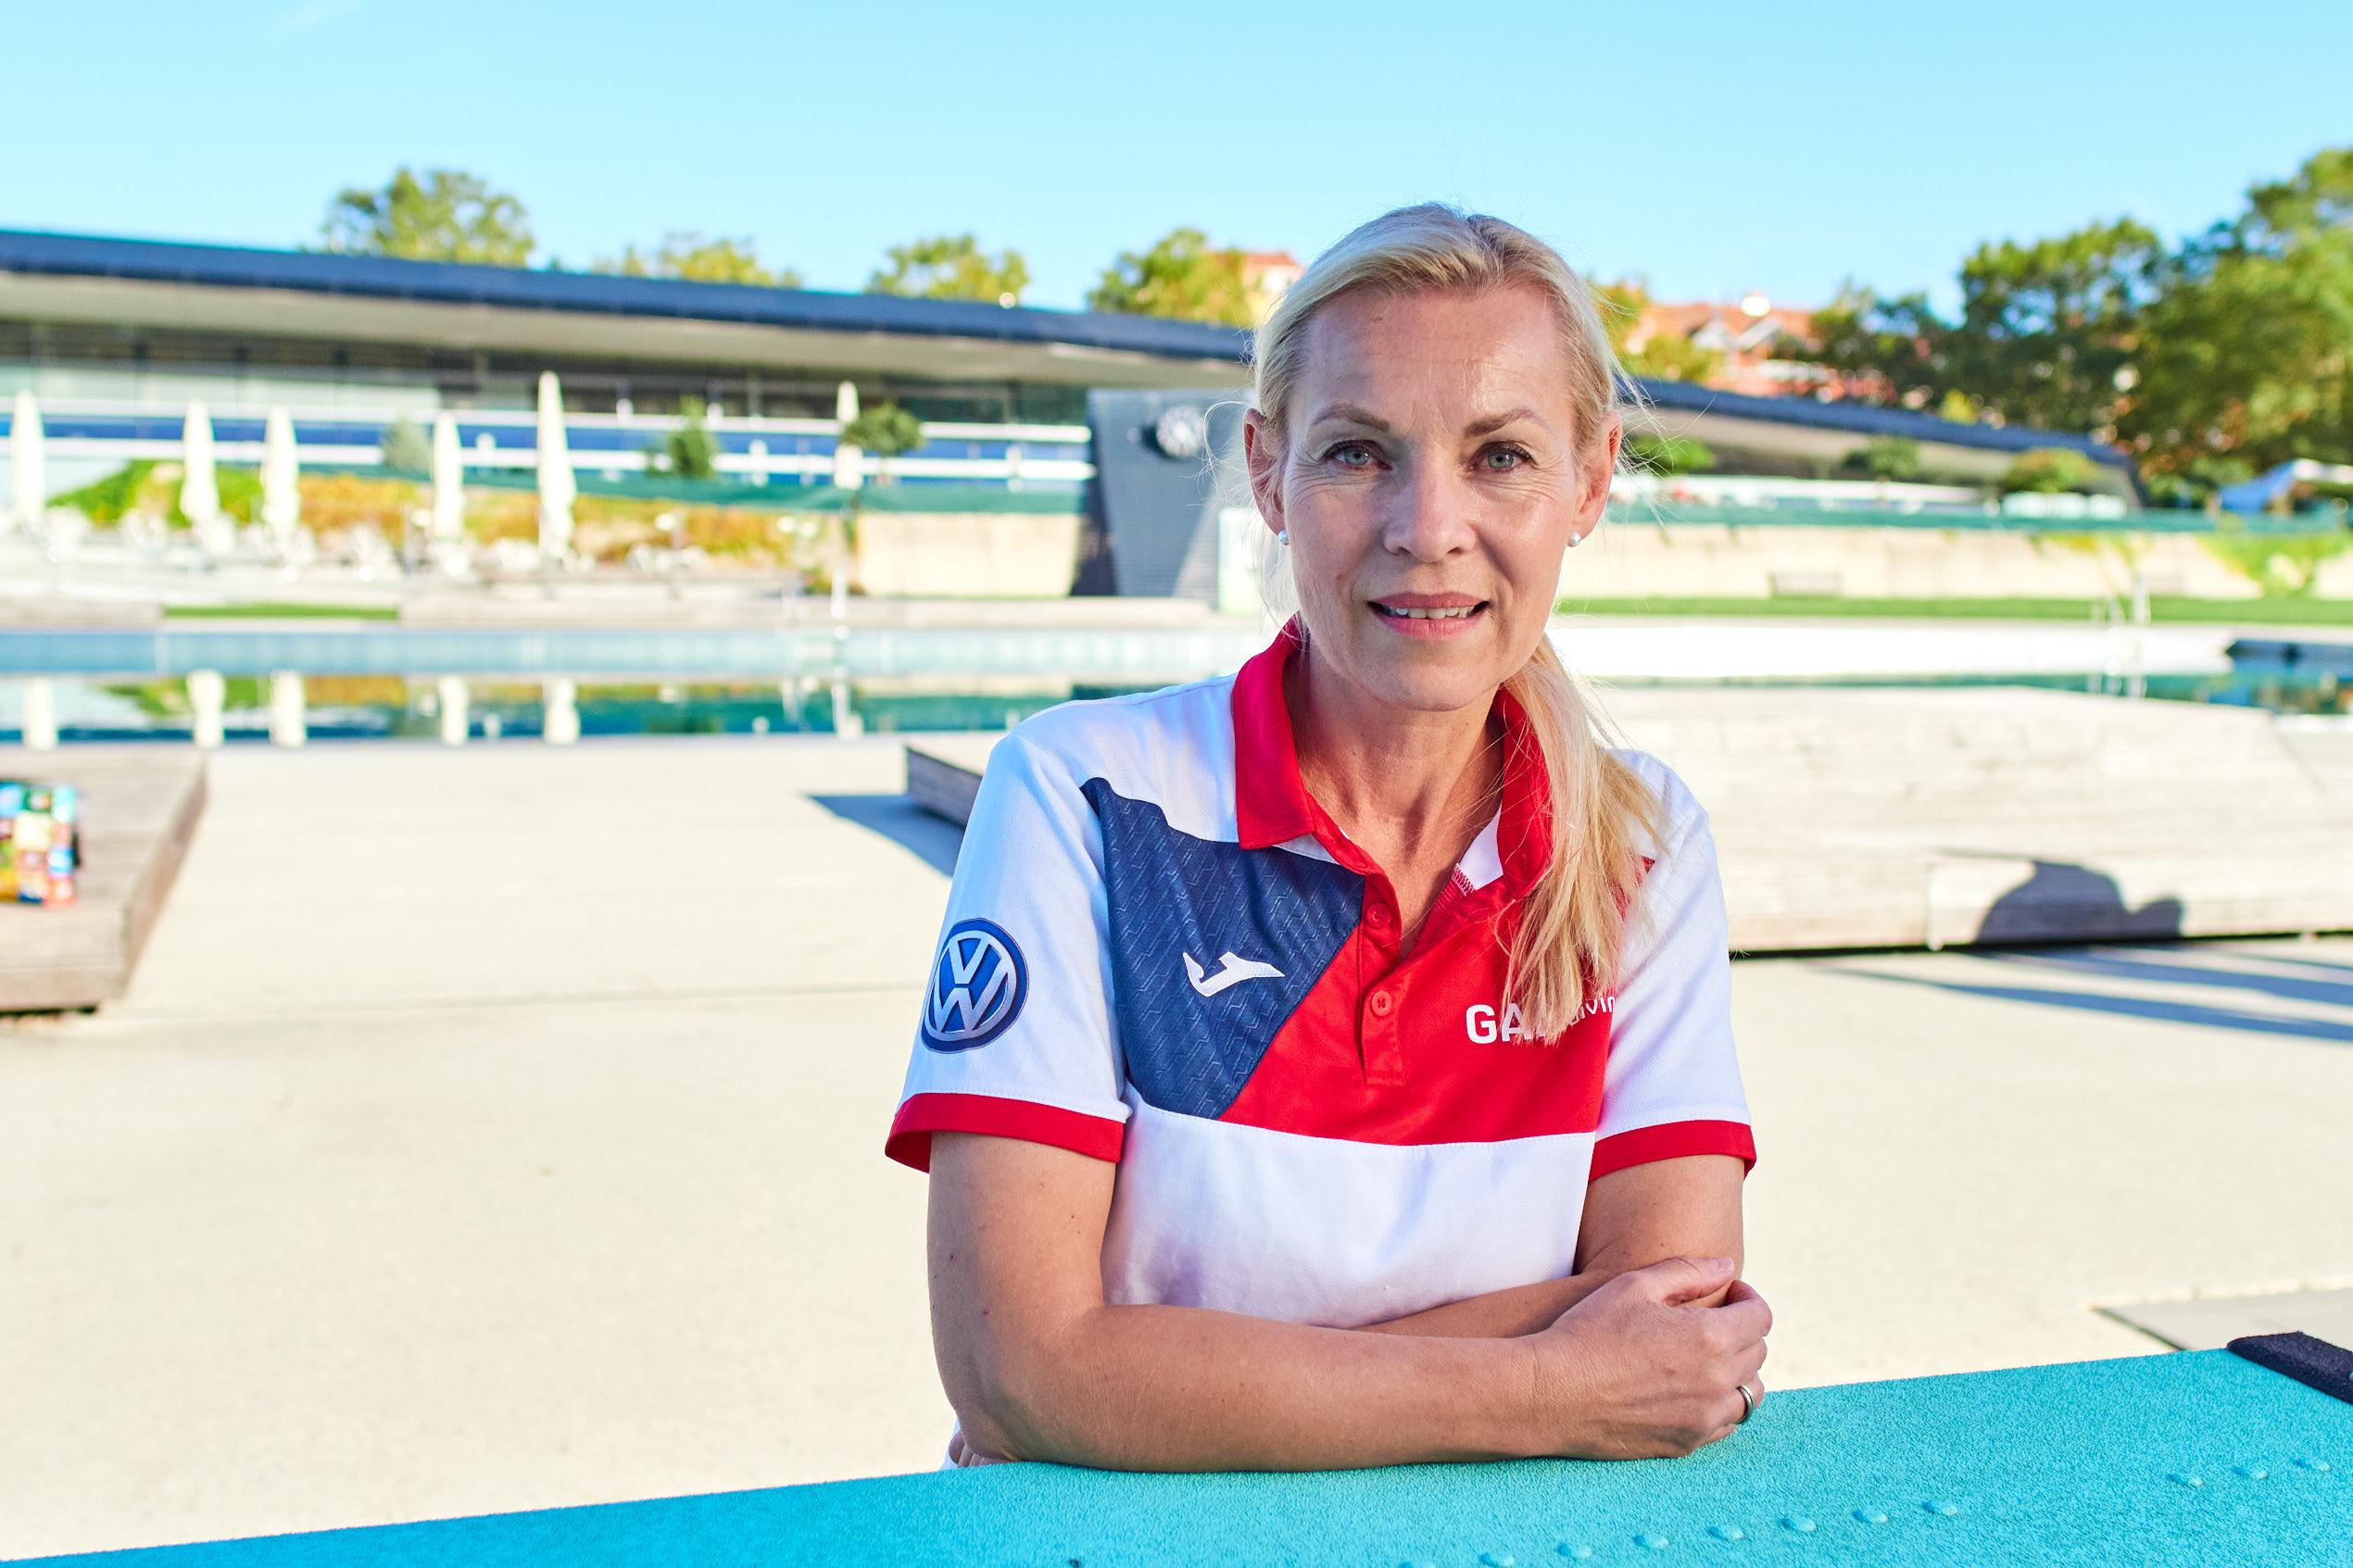 Sigrid Külper-Siefken